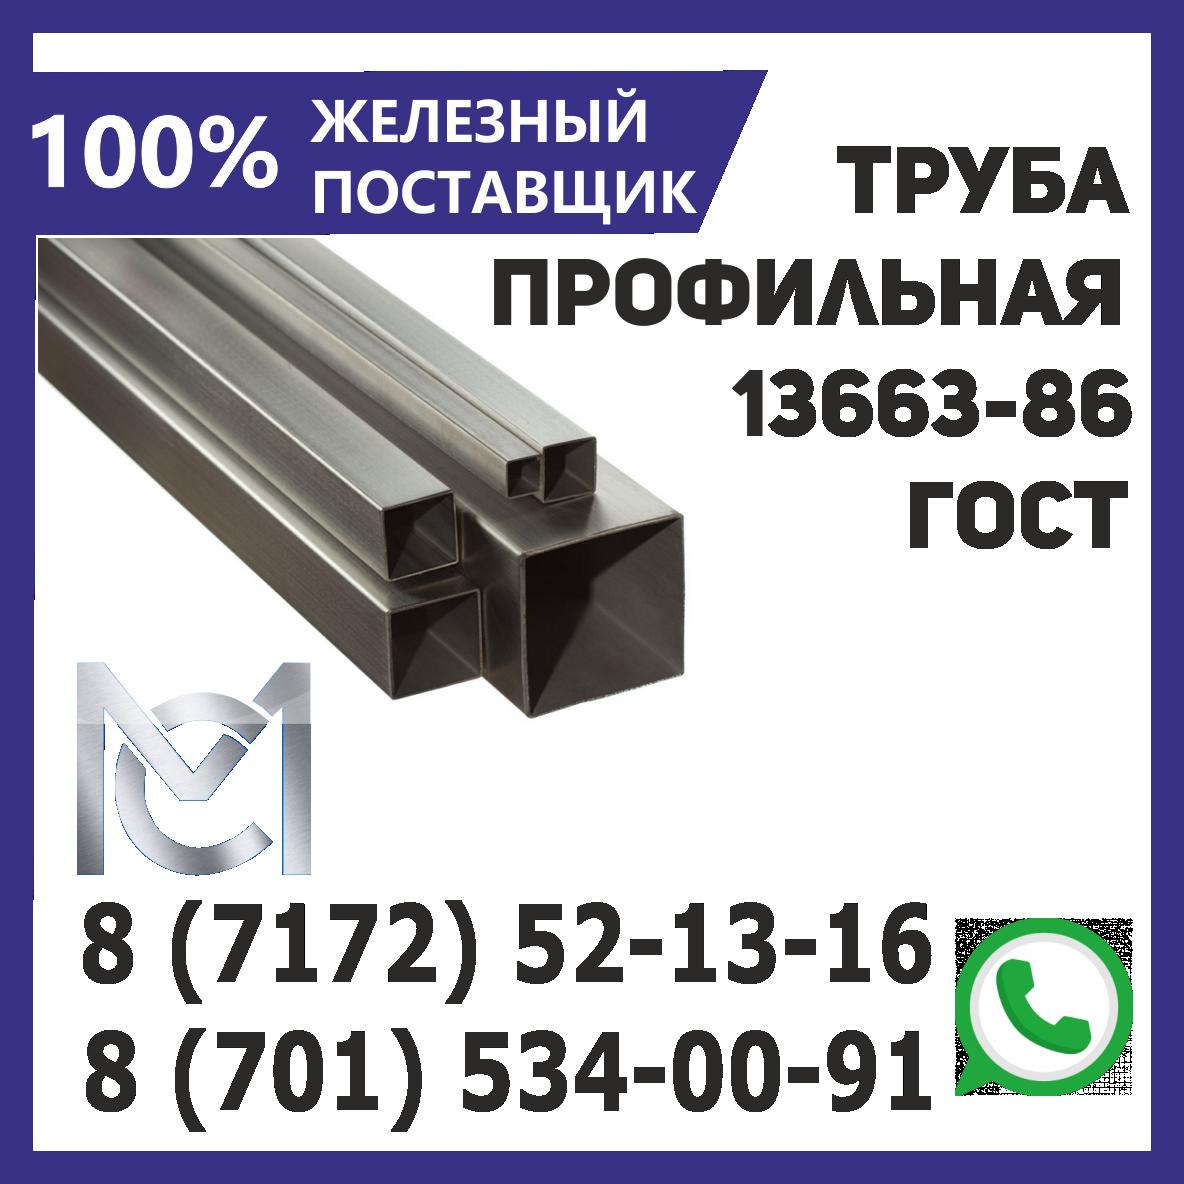 Труба профильная Д200х200 5-6мм ГОСТ 13663-86 стальная 12 метров